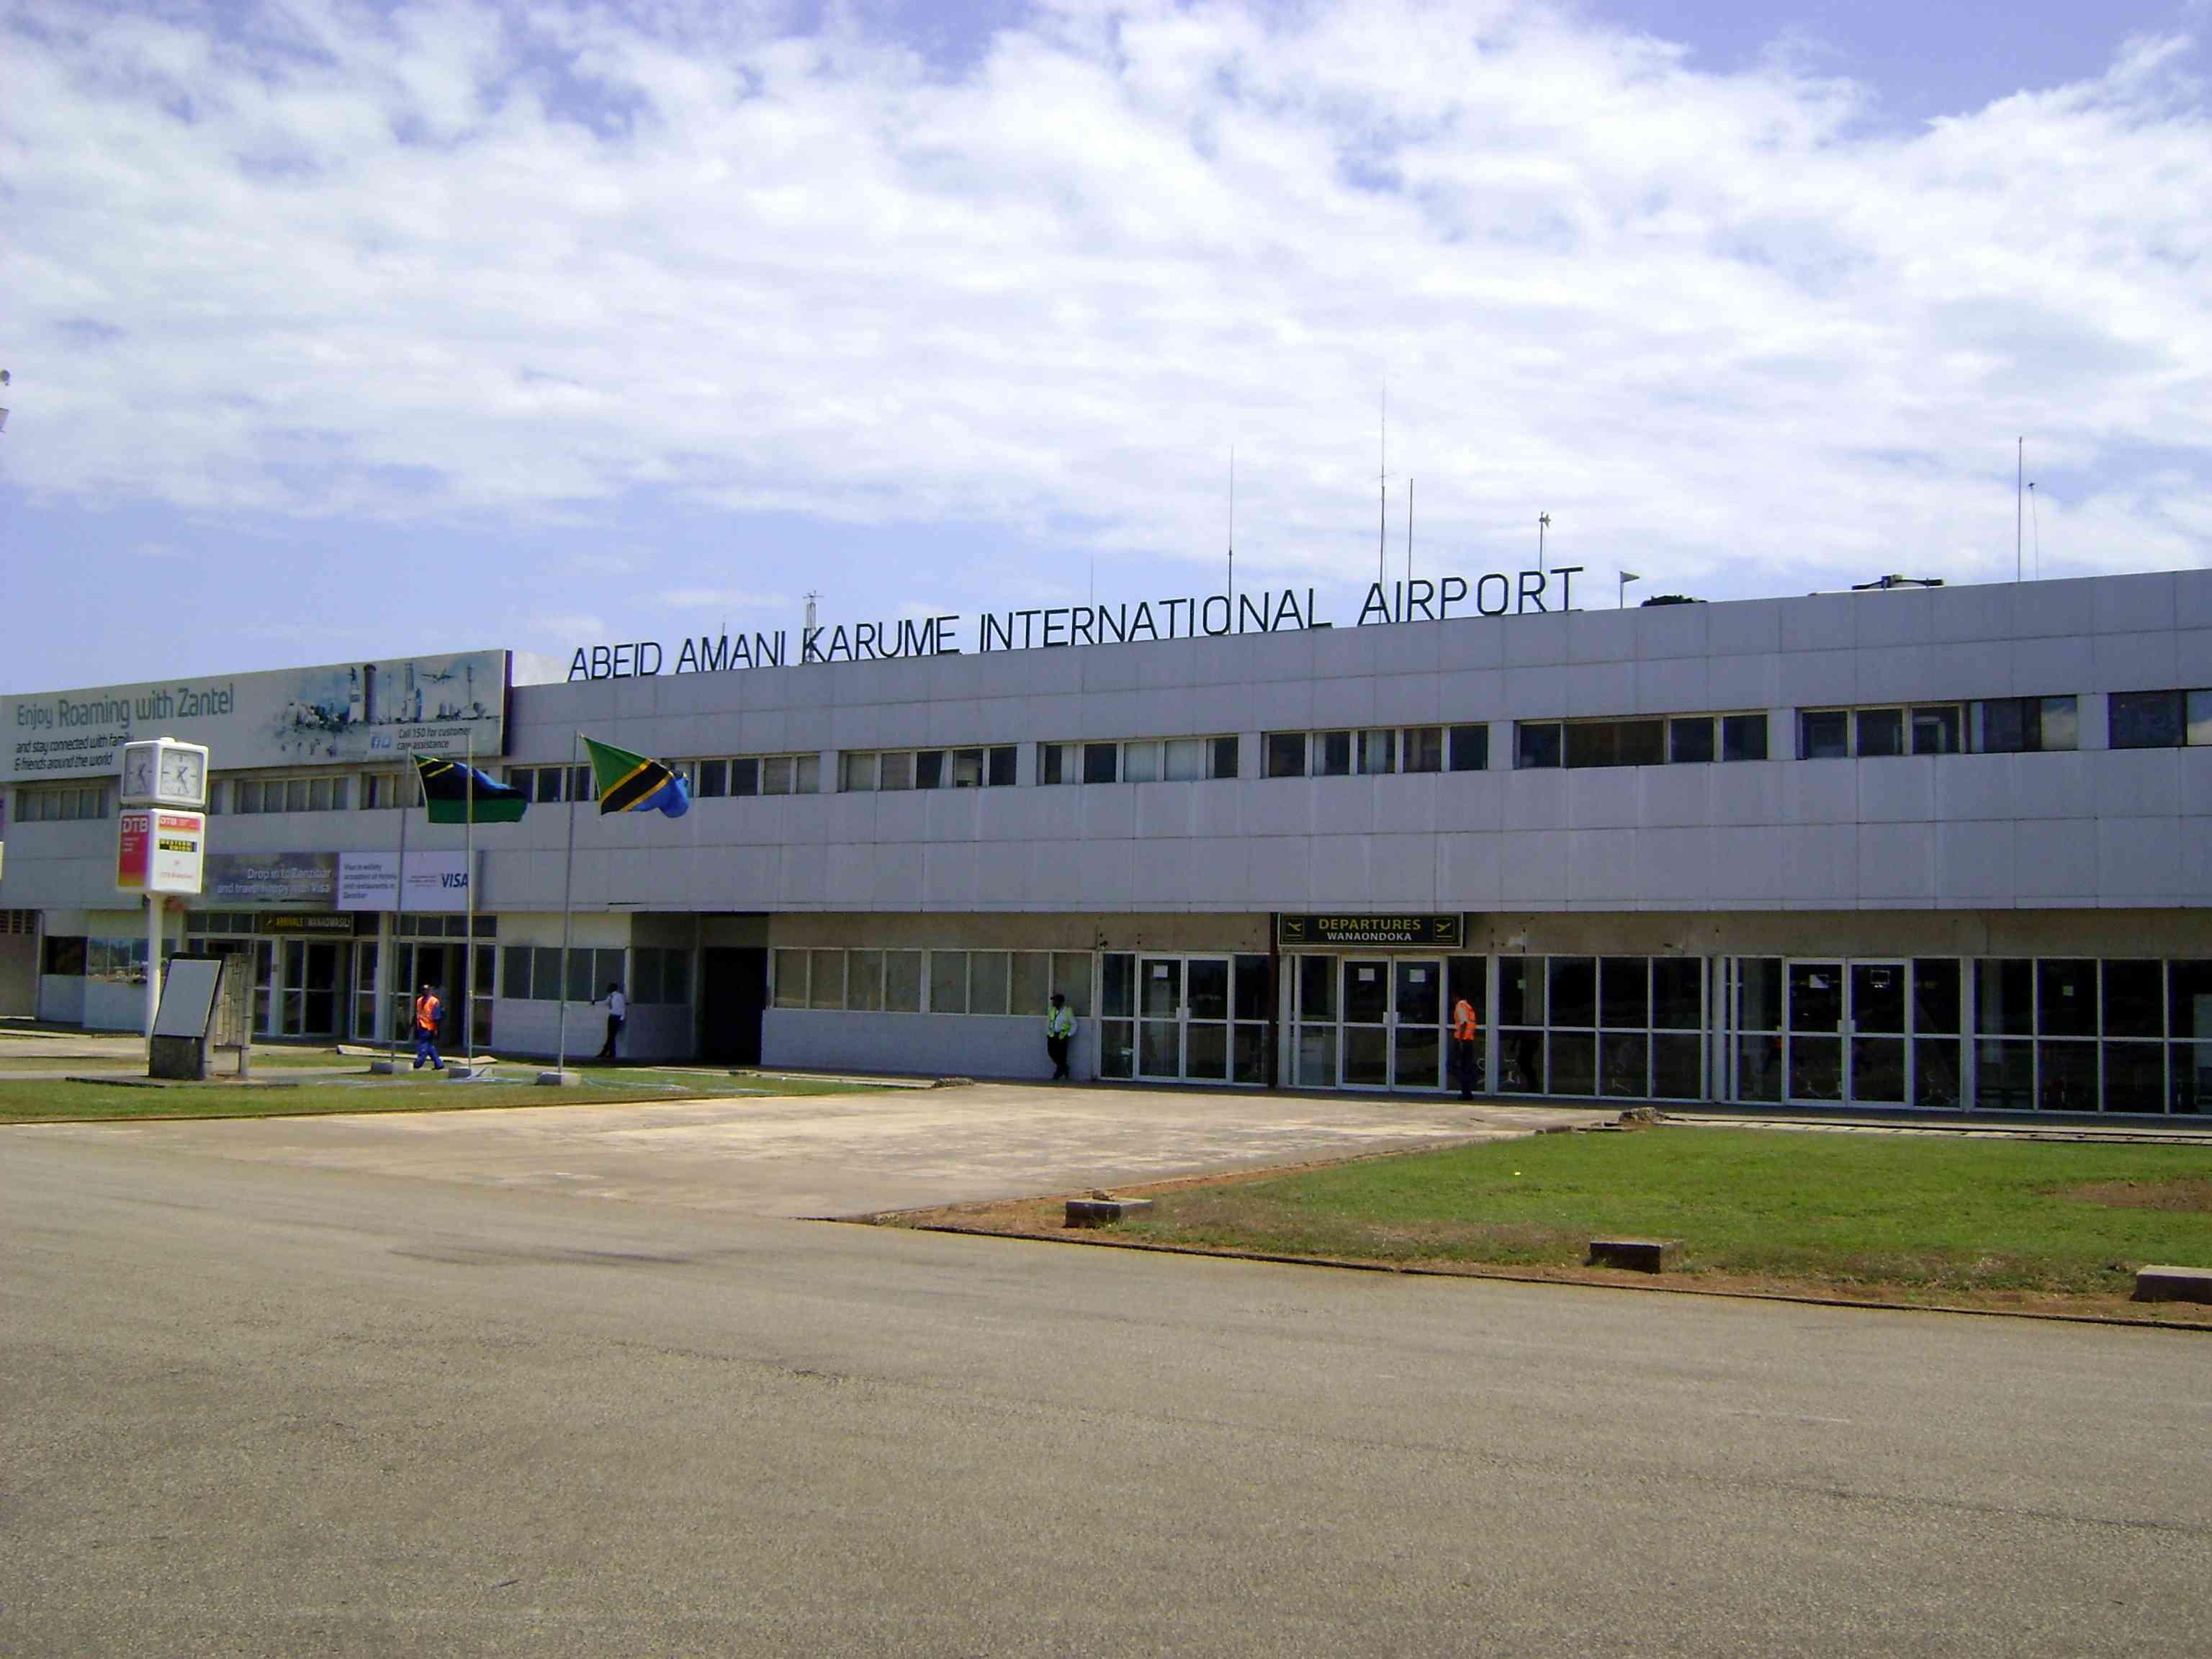 Abeid Amani Karume International Airport